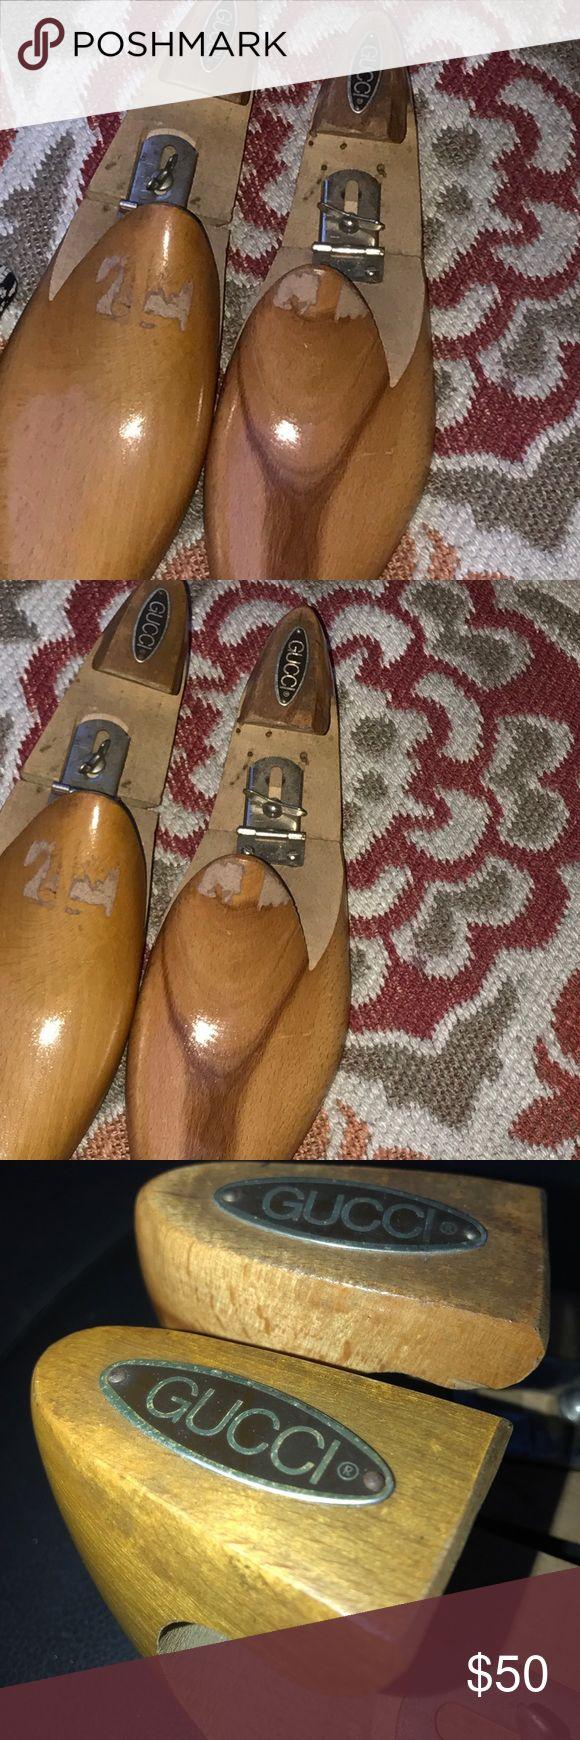 Vintage Gucci authentic wooden shoe stretchers For a men's size 12 & up Gucci Shoes